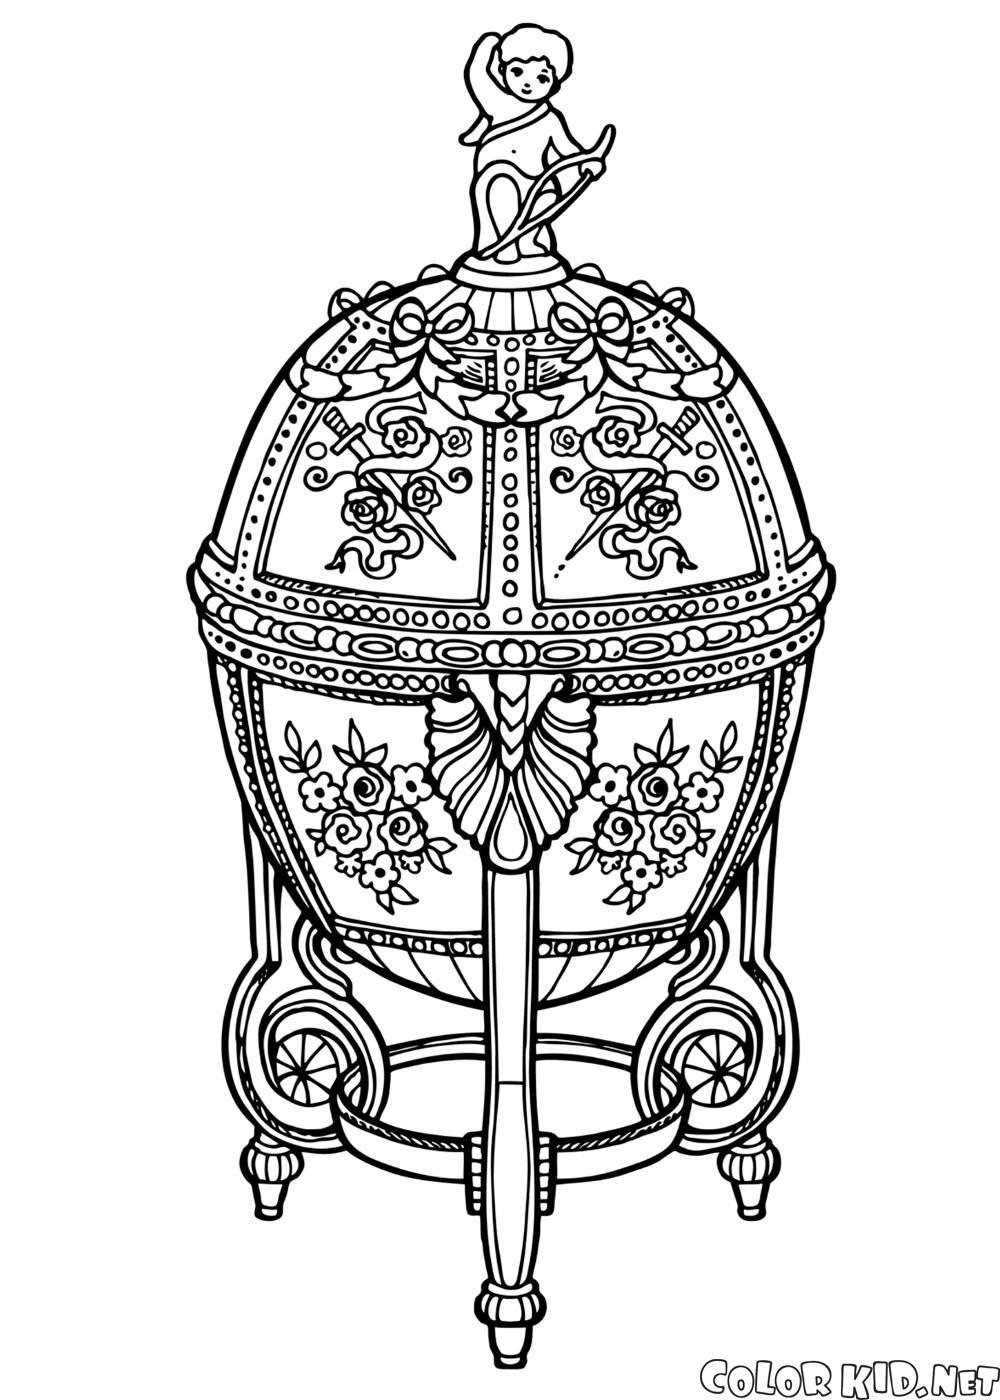 Boyama Sayfasi Faberge Yumurta